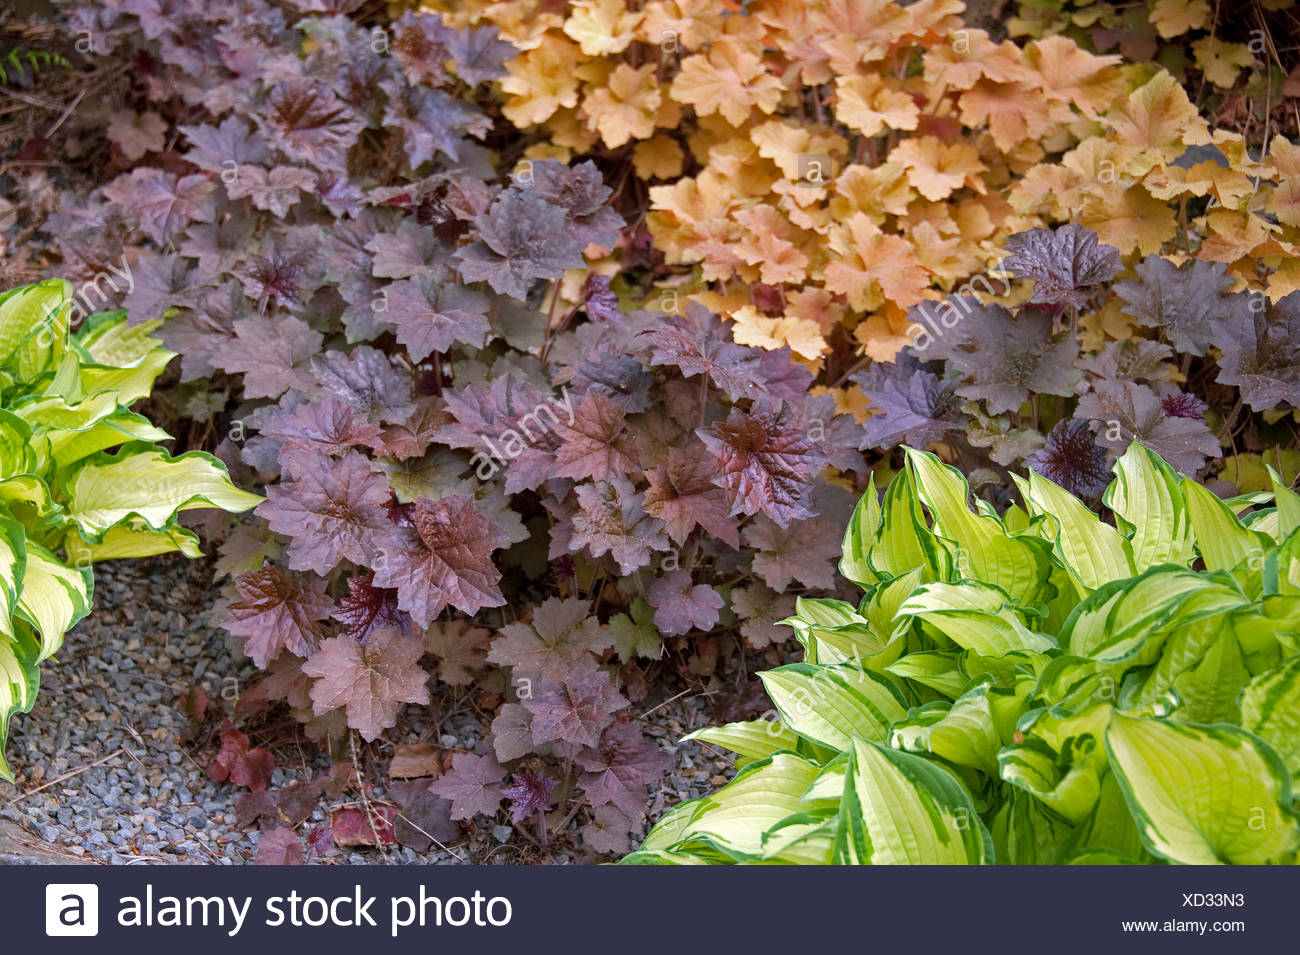 Heuchera (Heuchera 'Palace Purple', Heuchera Palace Purple), Sorte Palace Purple Stockbild